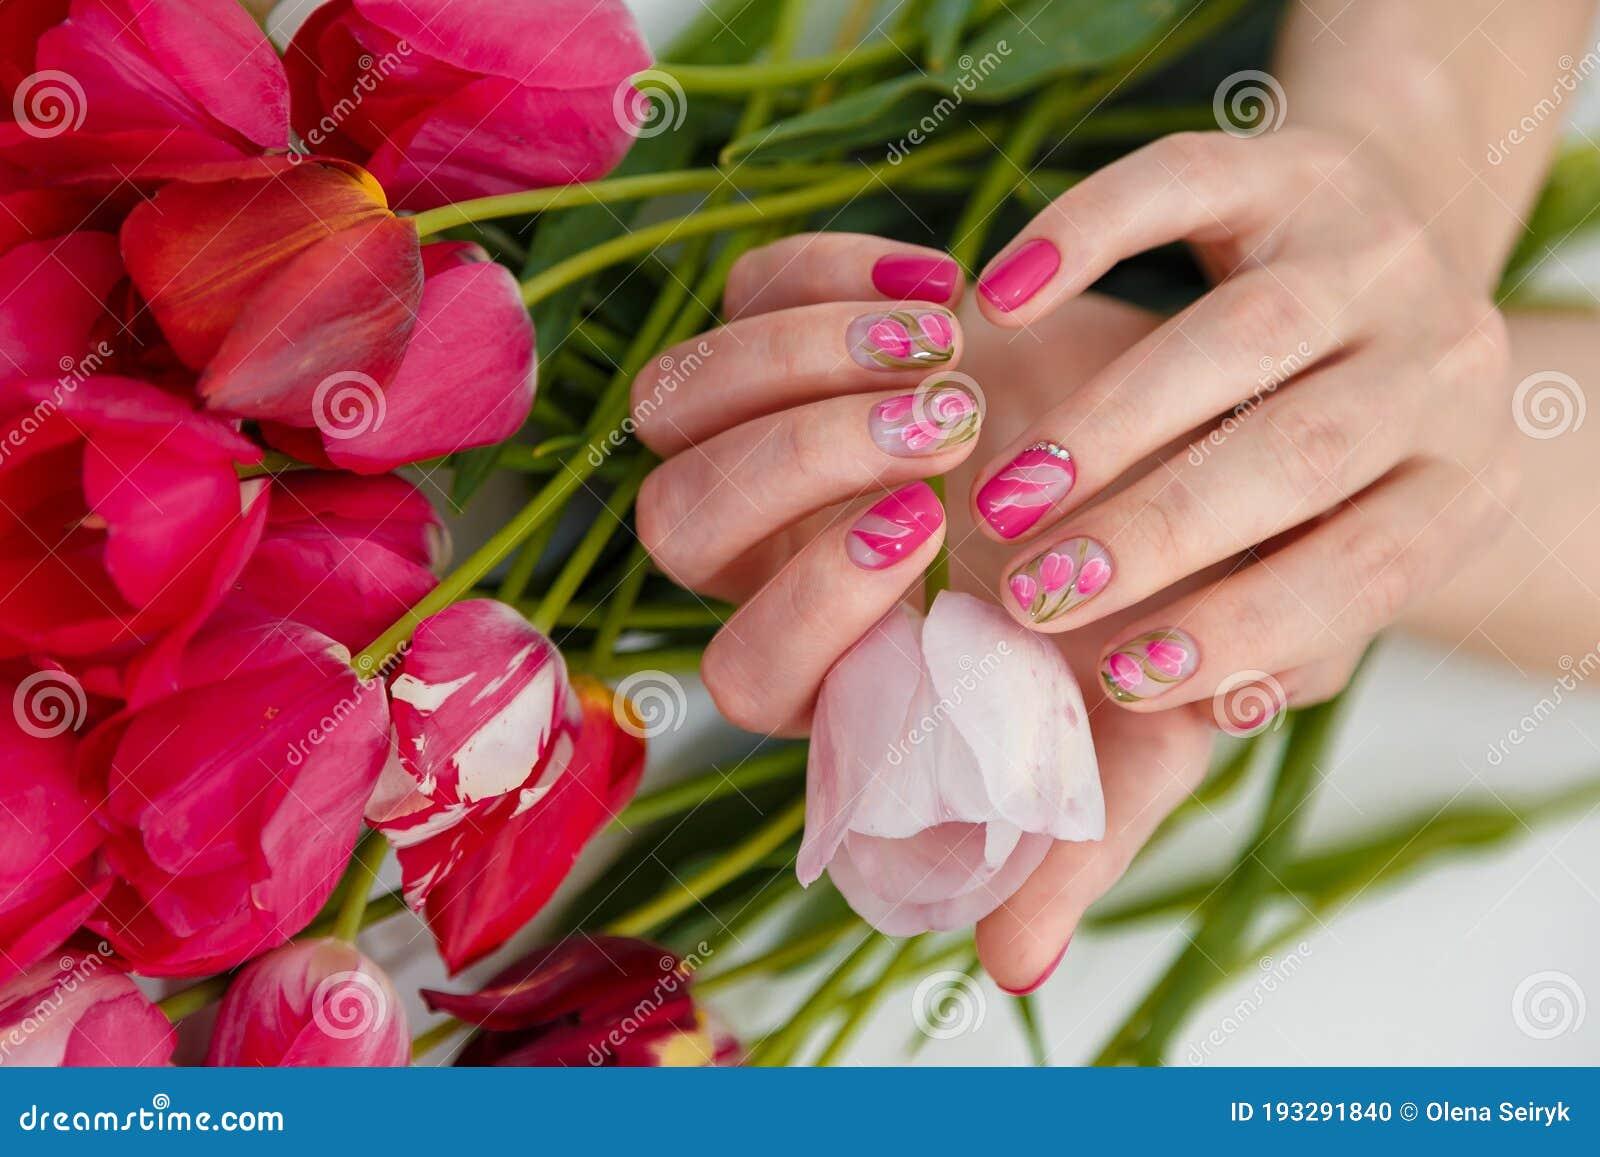 female hands tender spring manicure holding pink fresh tulip flowers background nail art gel nails polish design beauty 193291840